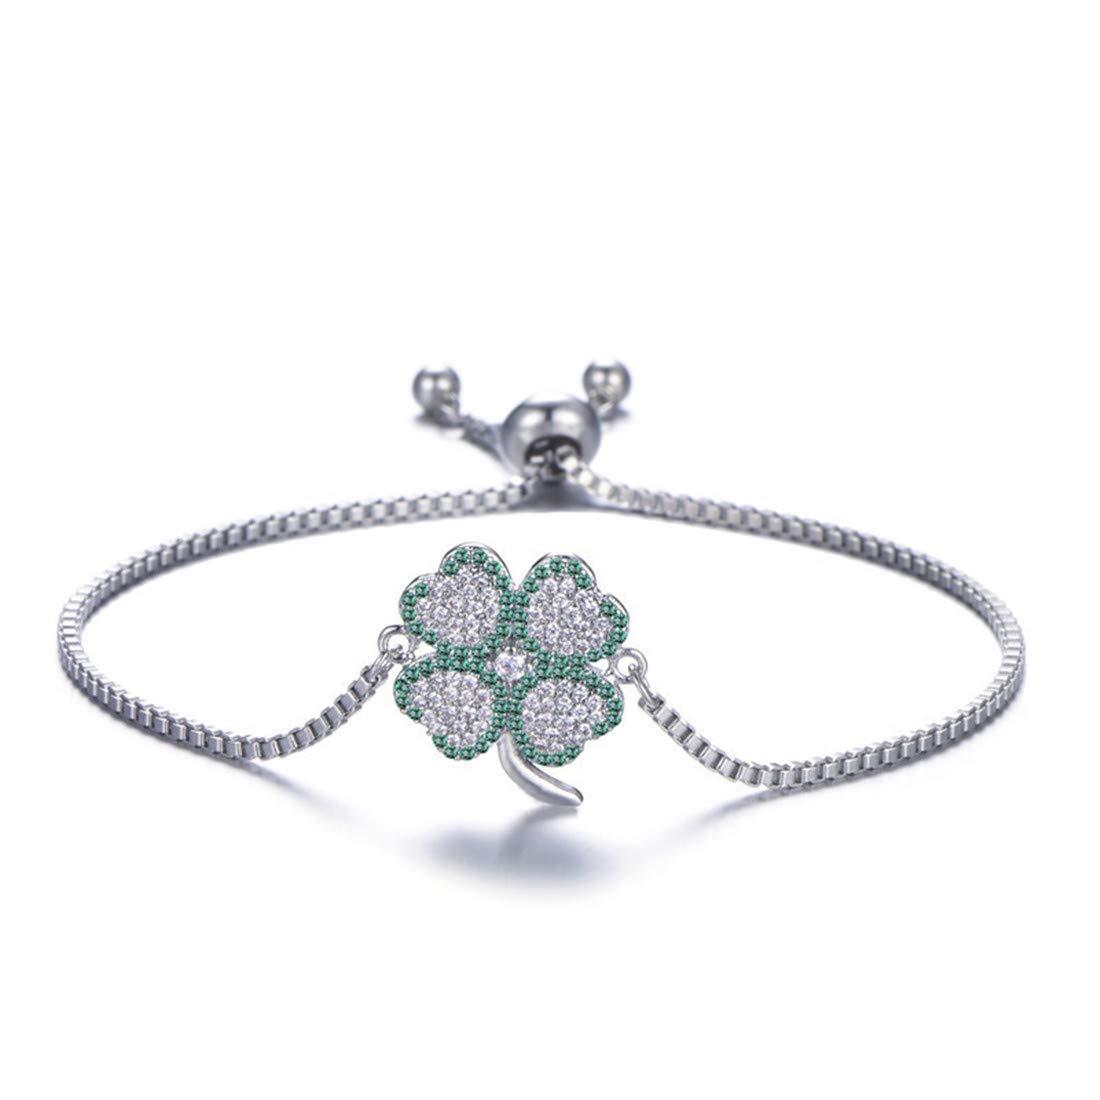 Mrsrui Crystal Jewelry Bridal Rhinestone Bracelet Stretch - Ideal for Wedding, Prom, Party or Pageant (A)